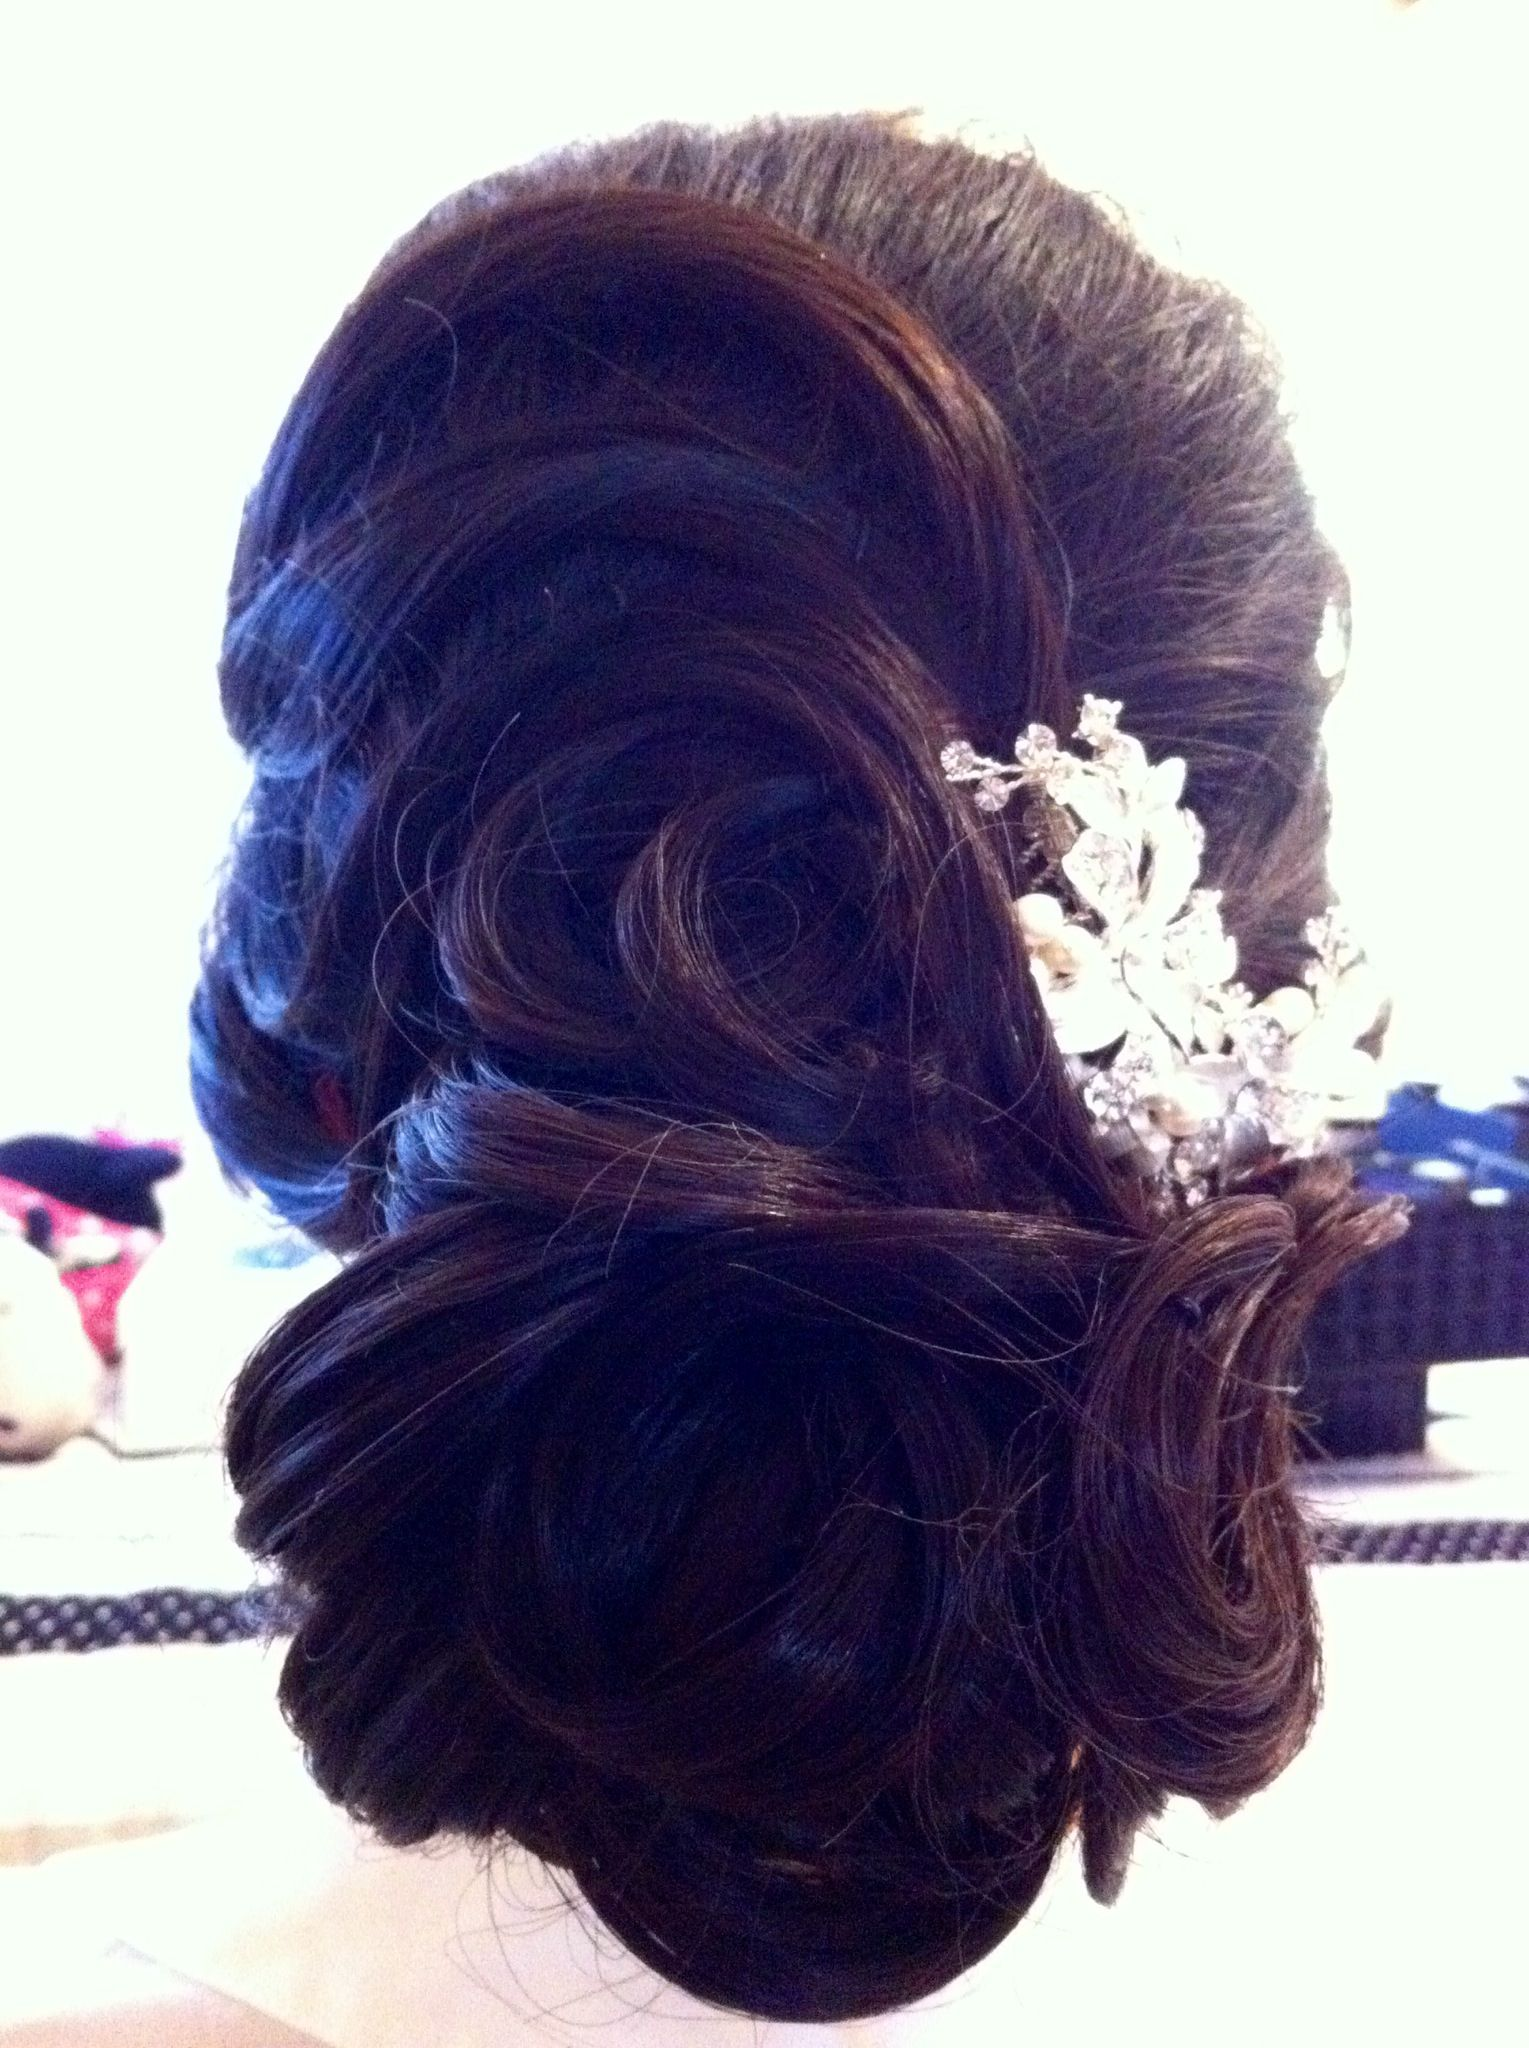 #bride #hair #davidgarza #makeup #artist #NuevoLaredo